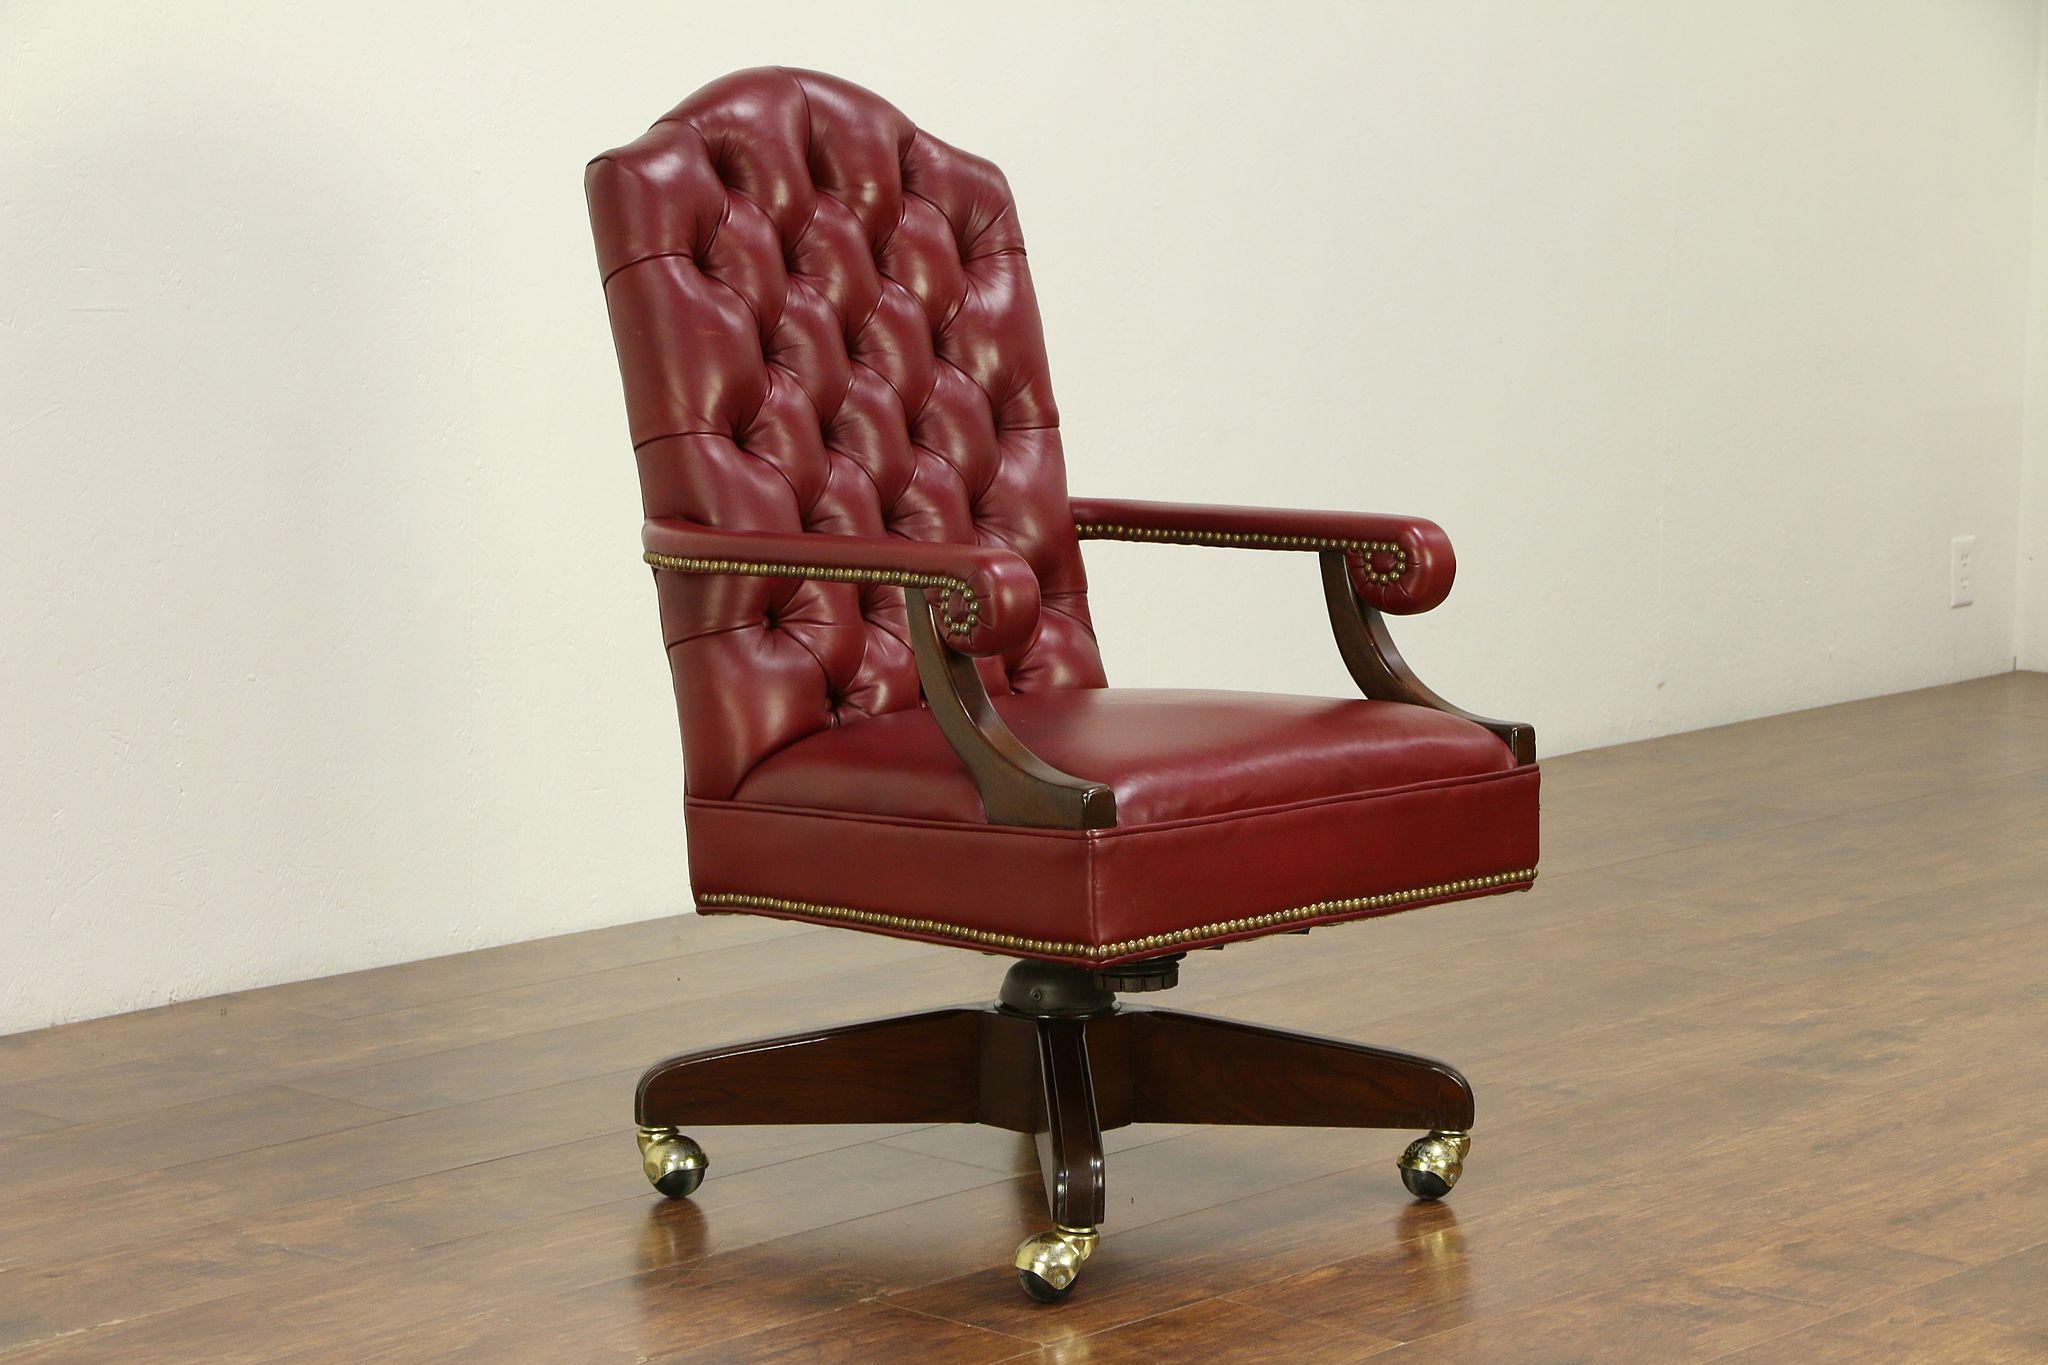 Surprising Harden Cherry Traditional Swivel Adjustable Desk Chair Faux Leather 30536 Short Links Chair Design For Home Short Linksinfo